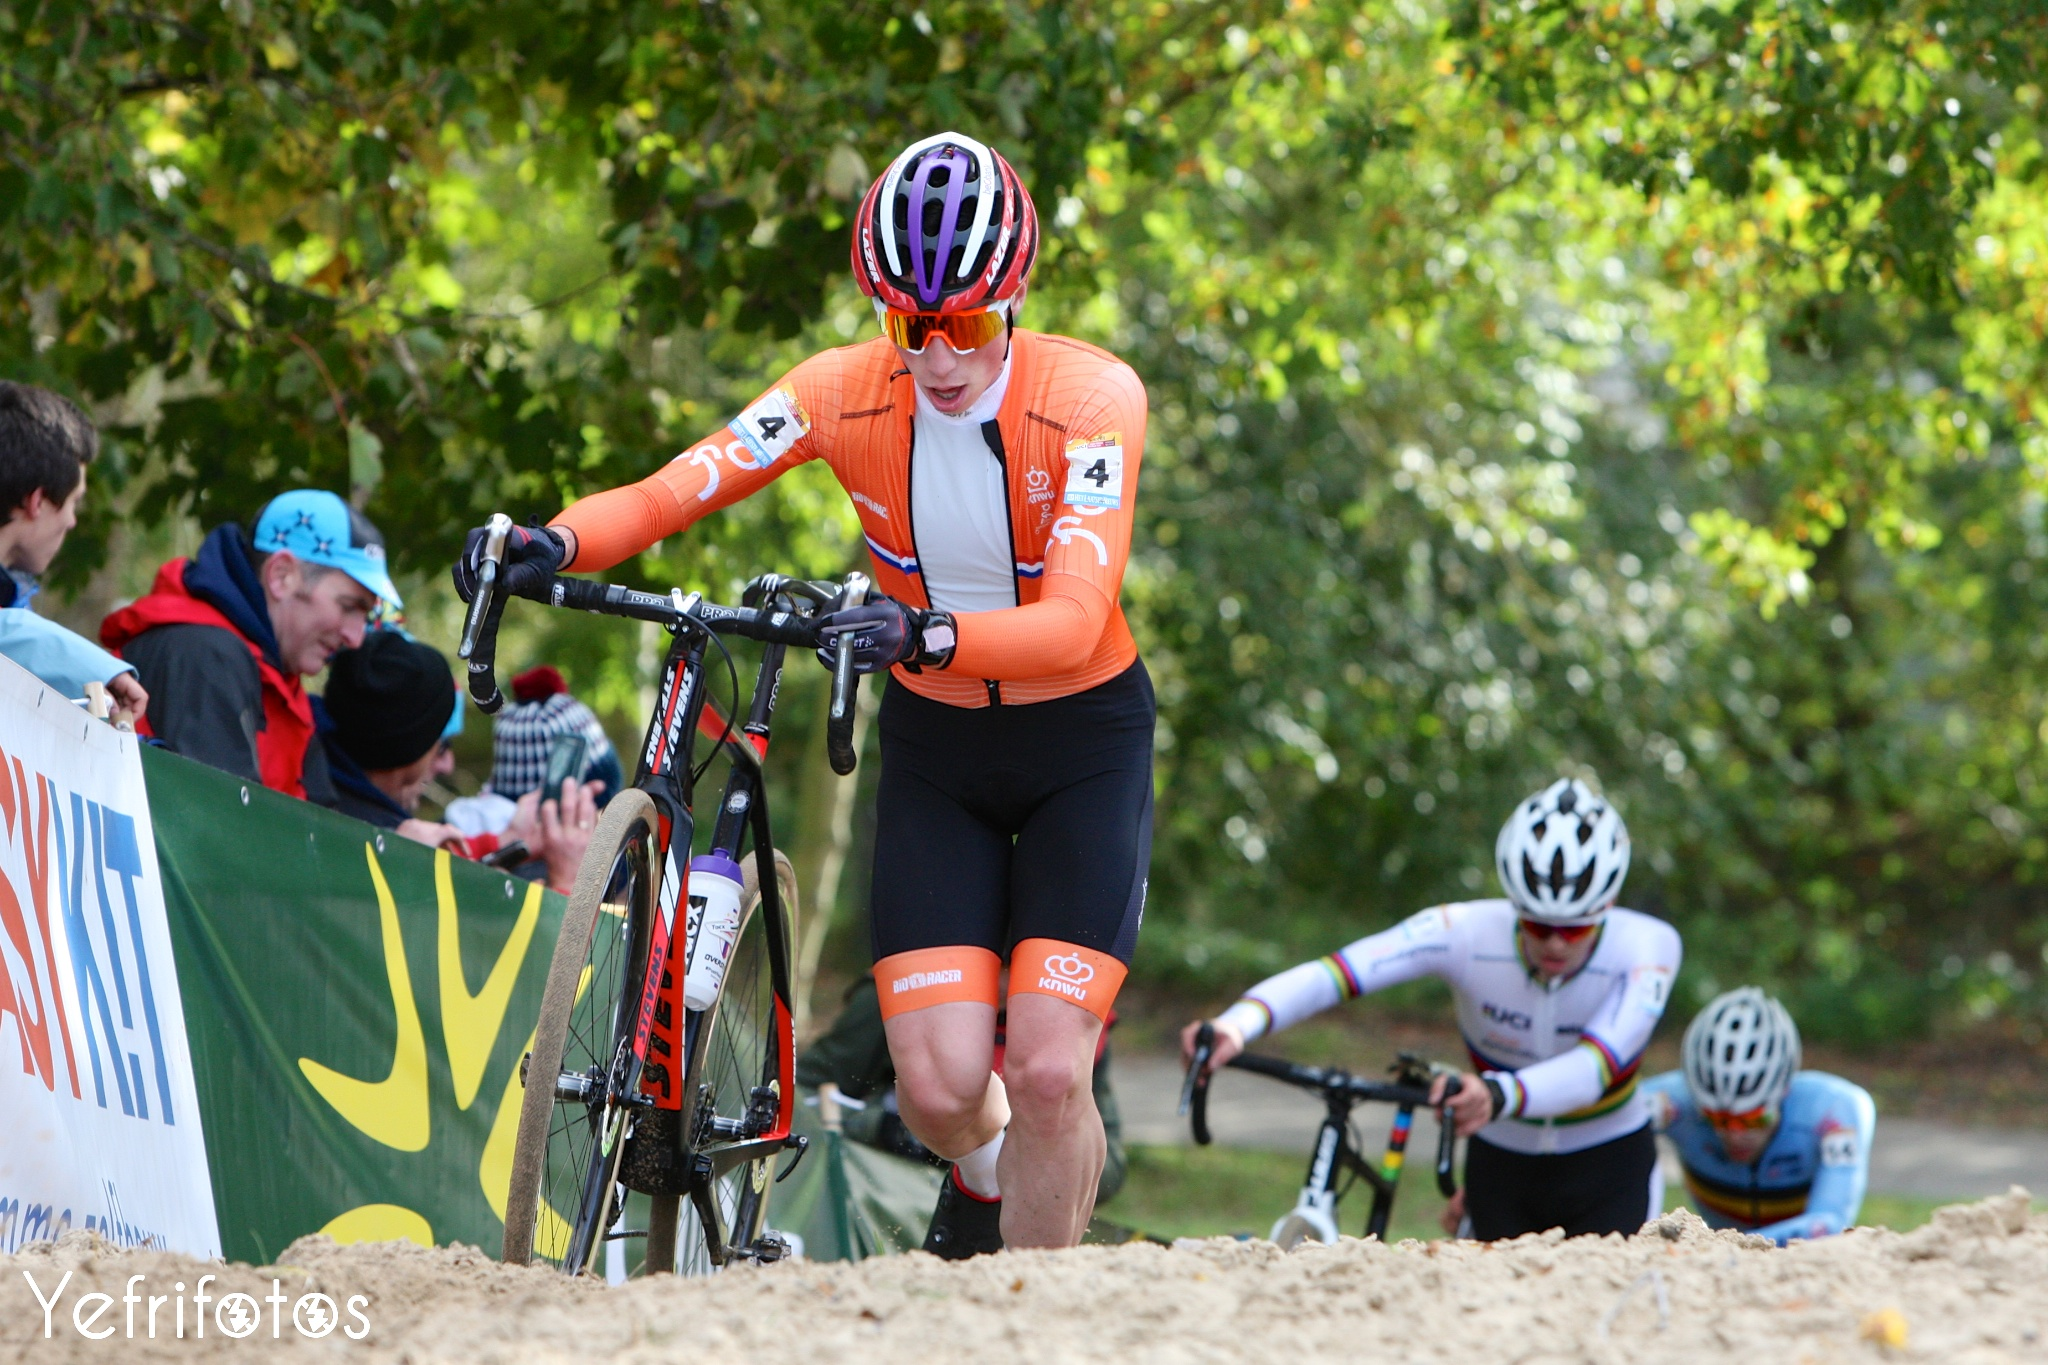 Koksijde - UCI Cyclocross World Cup - Jens Dekker